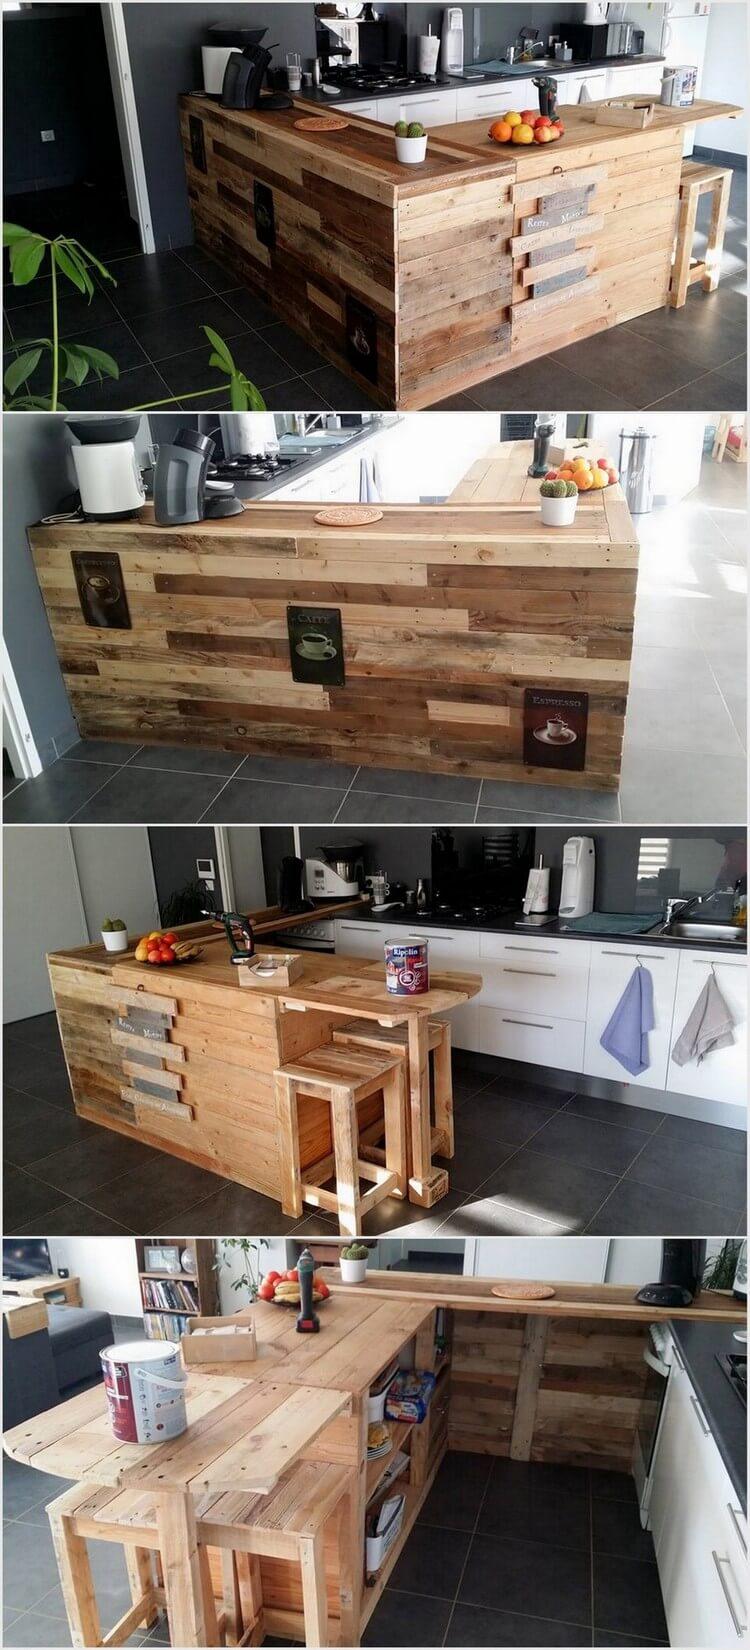 Wood Pallet Bar Idea